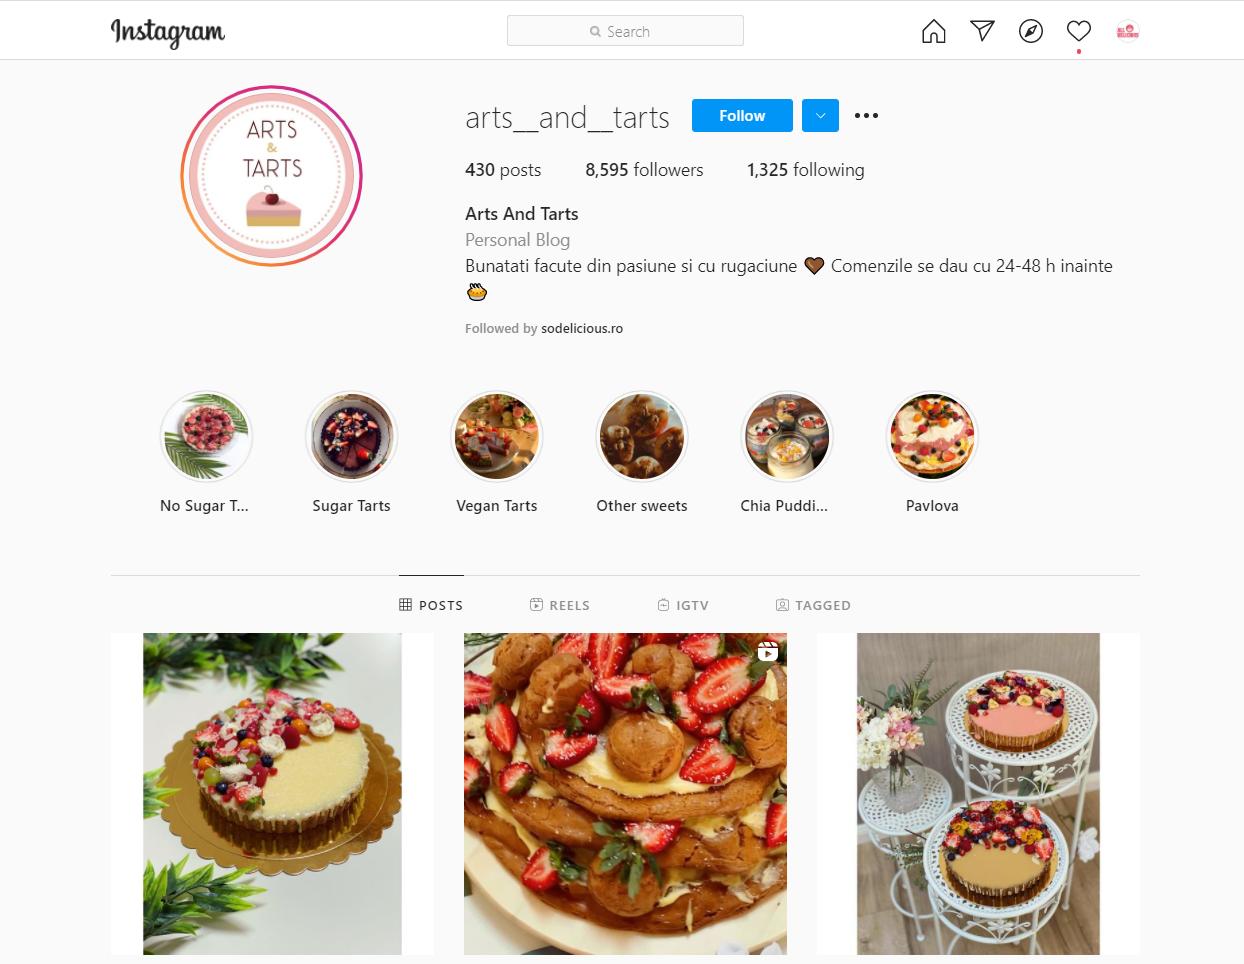 arts and tarts insta page